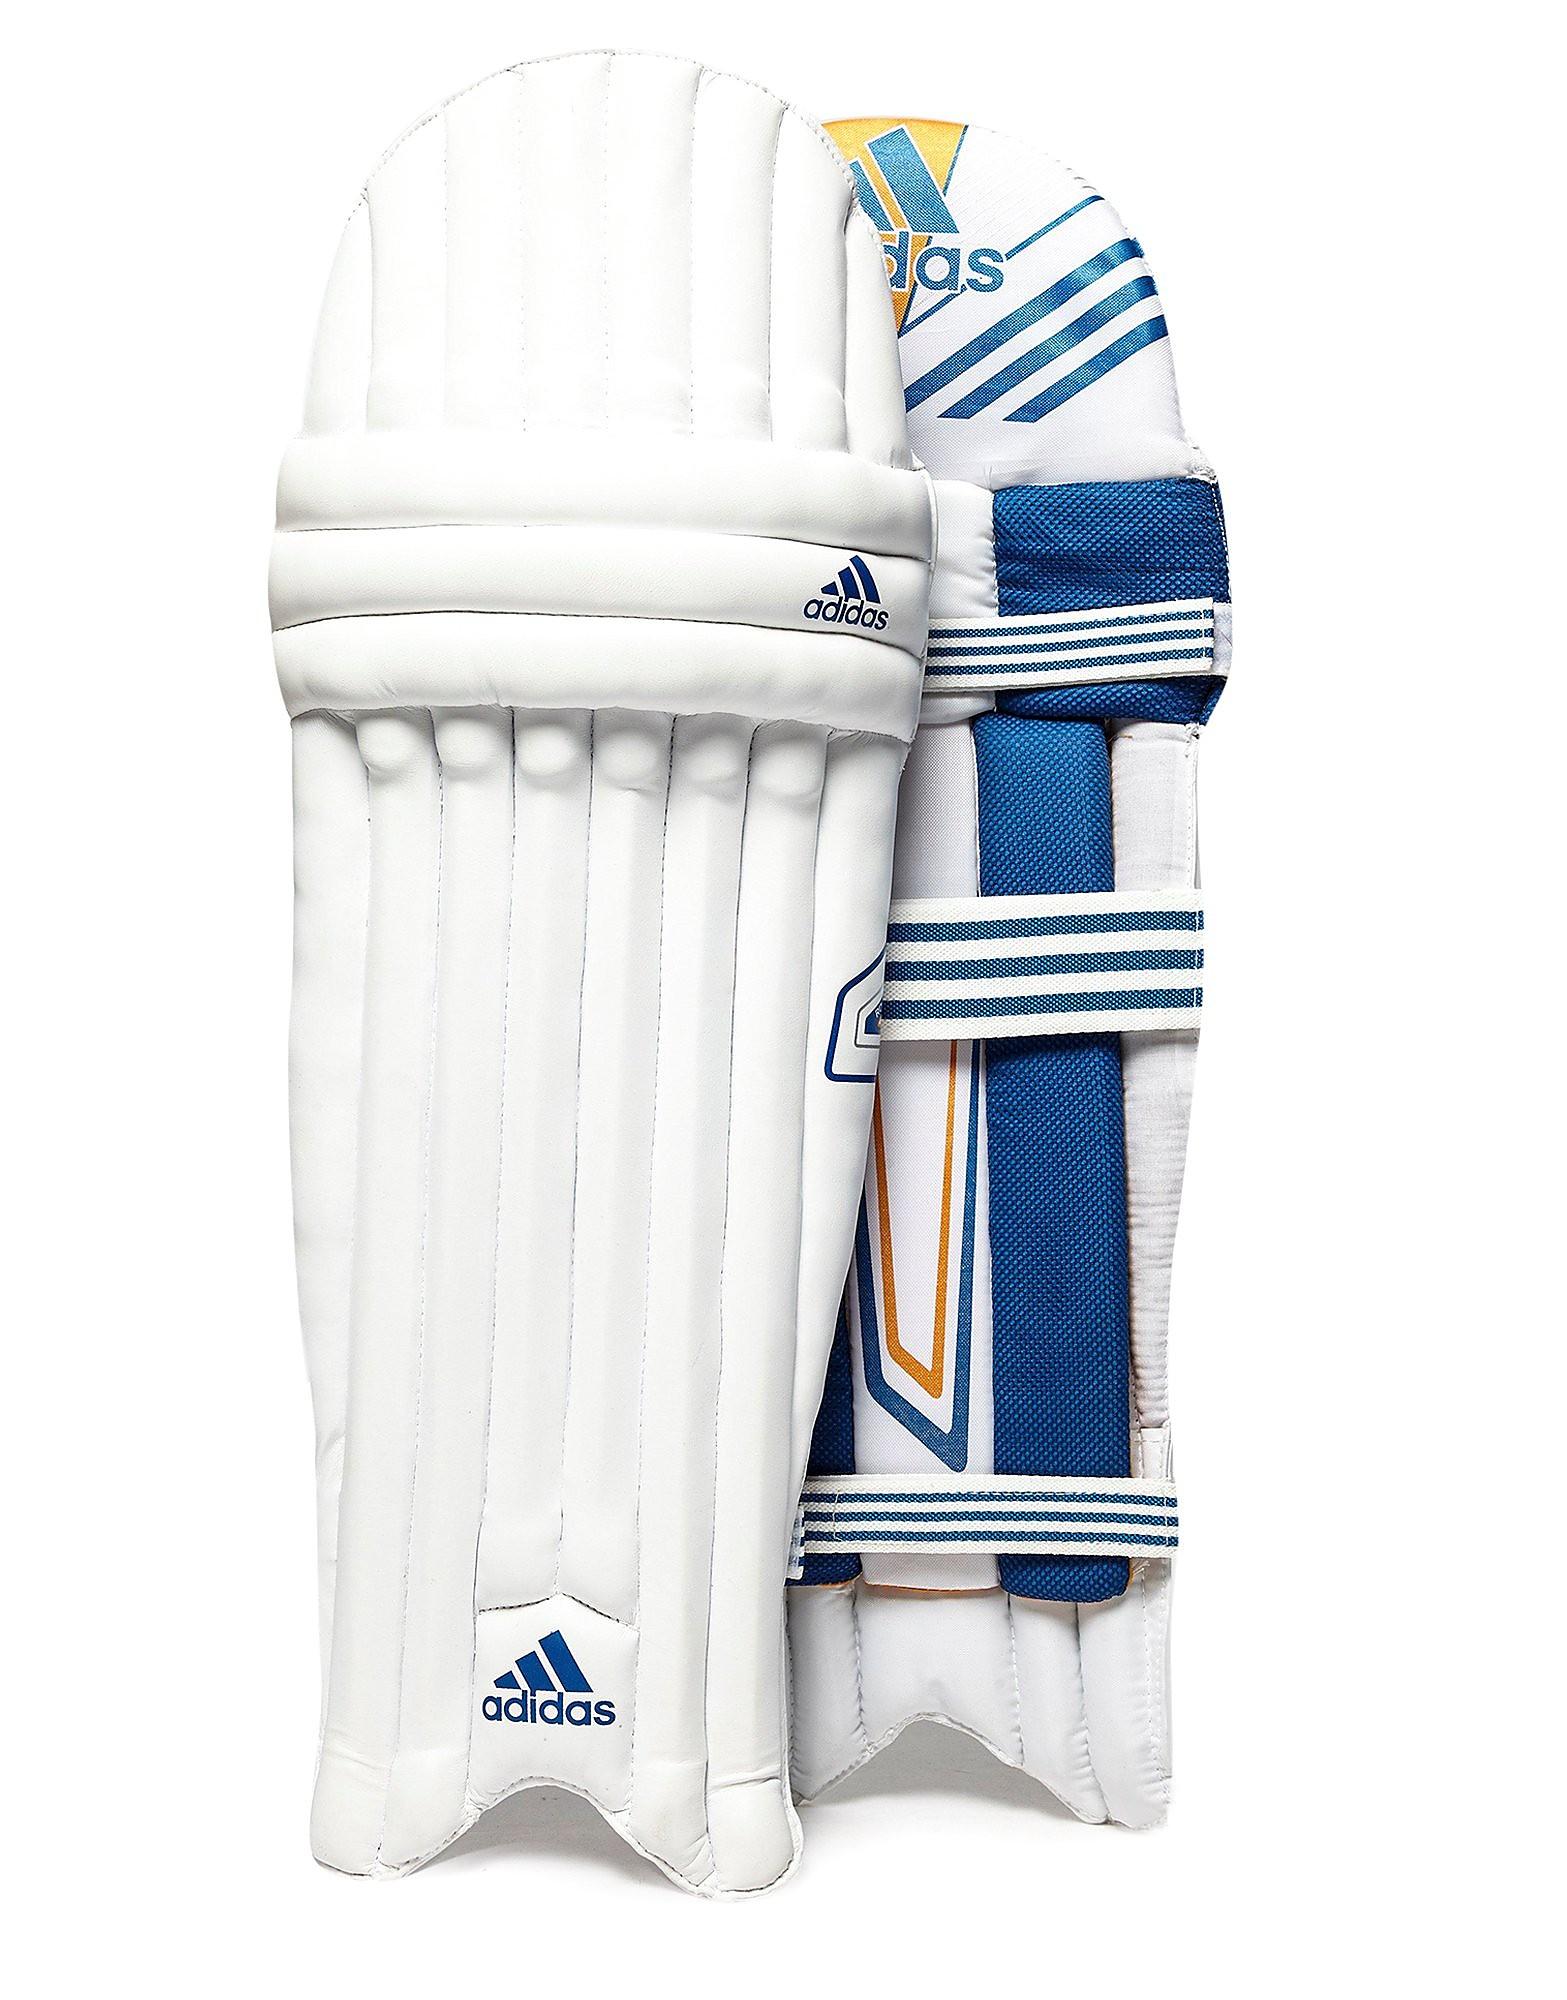 adidas Rookie Cricket Batting Pads